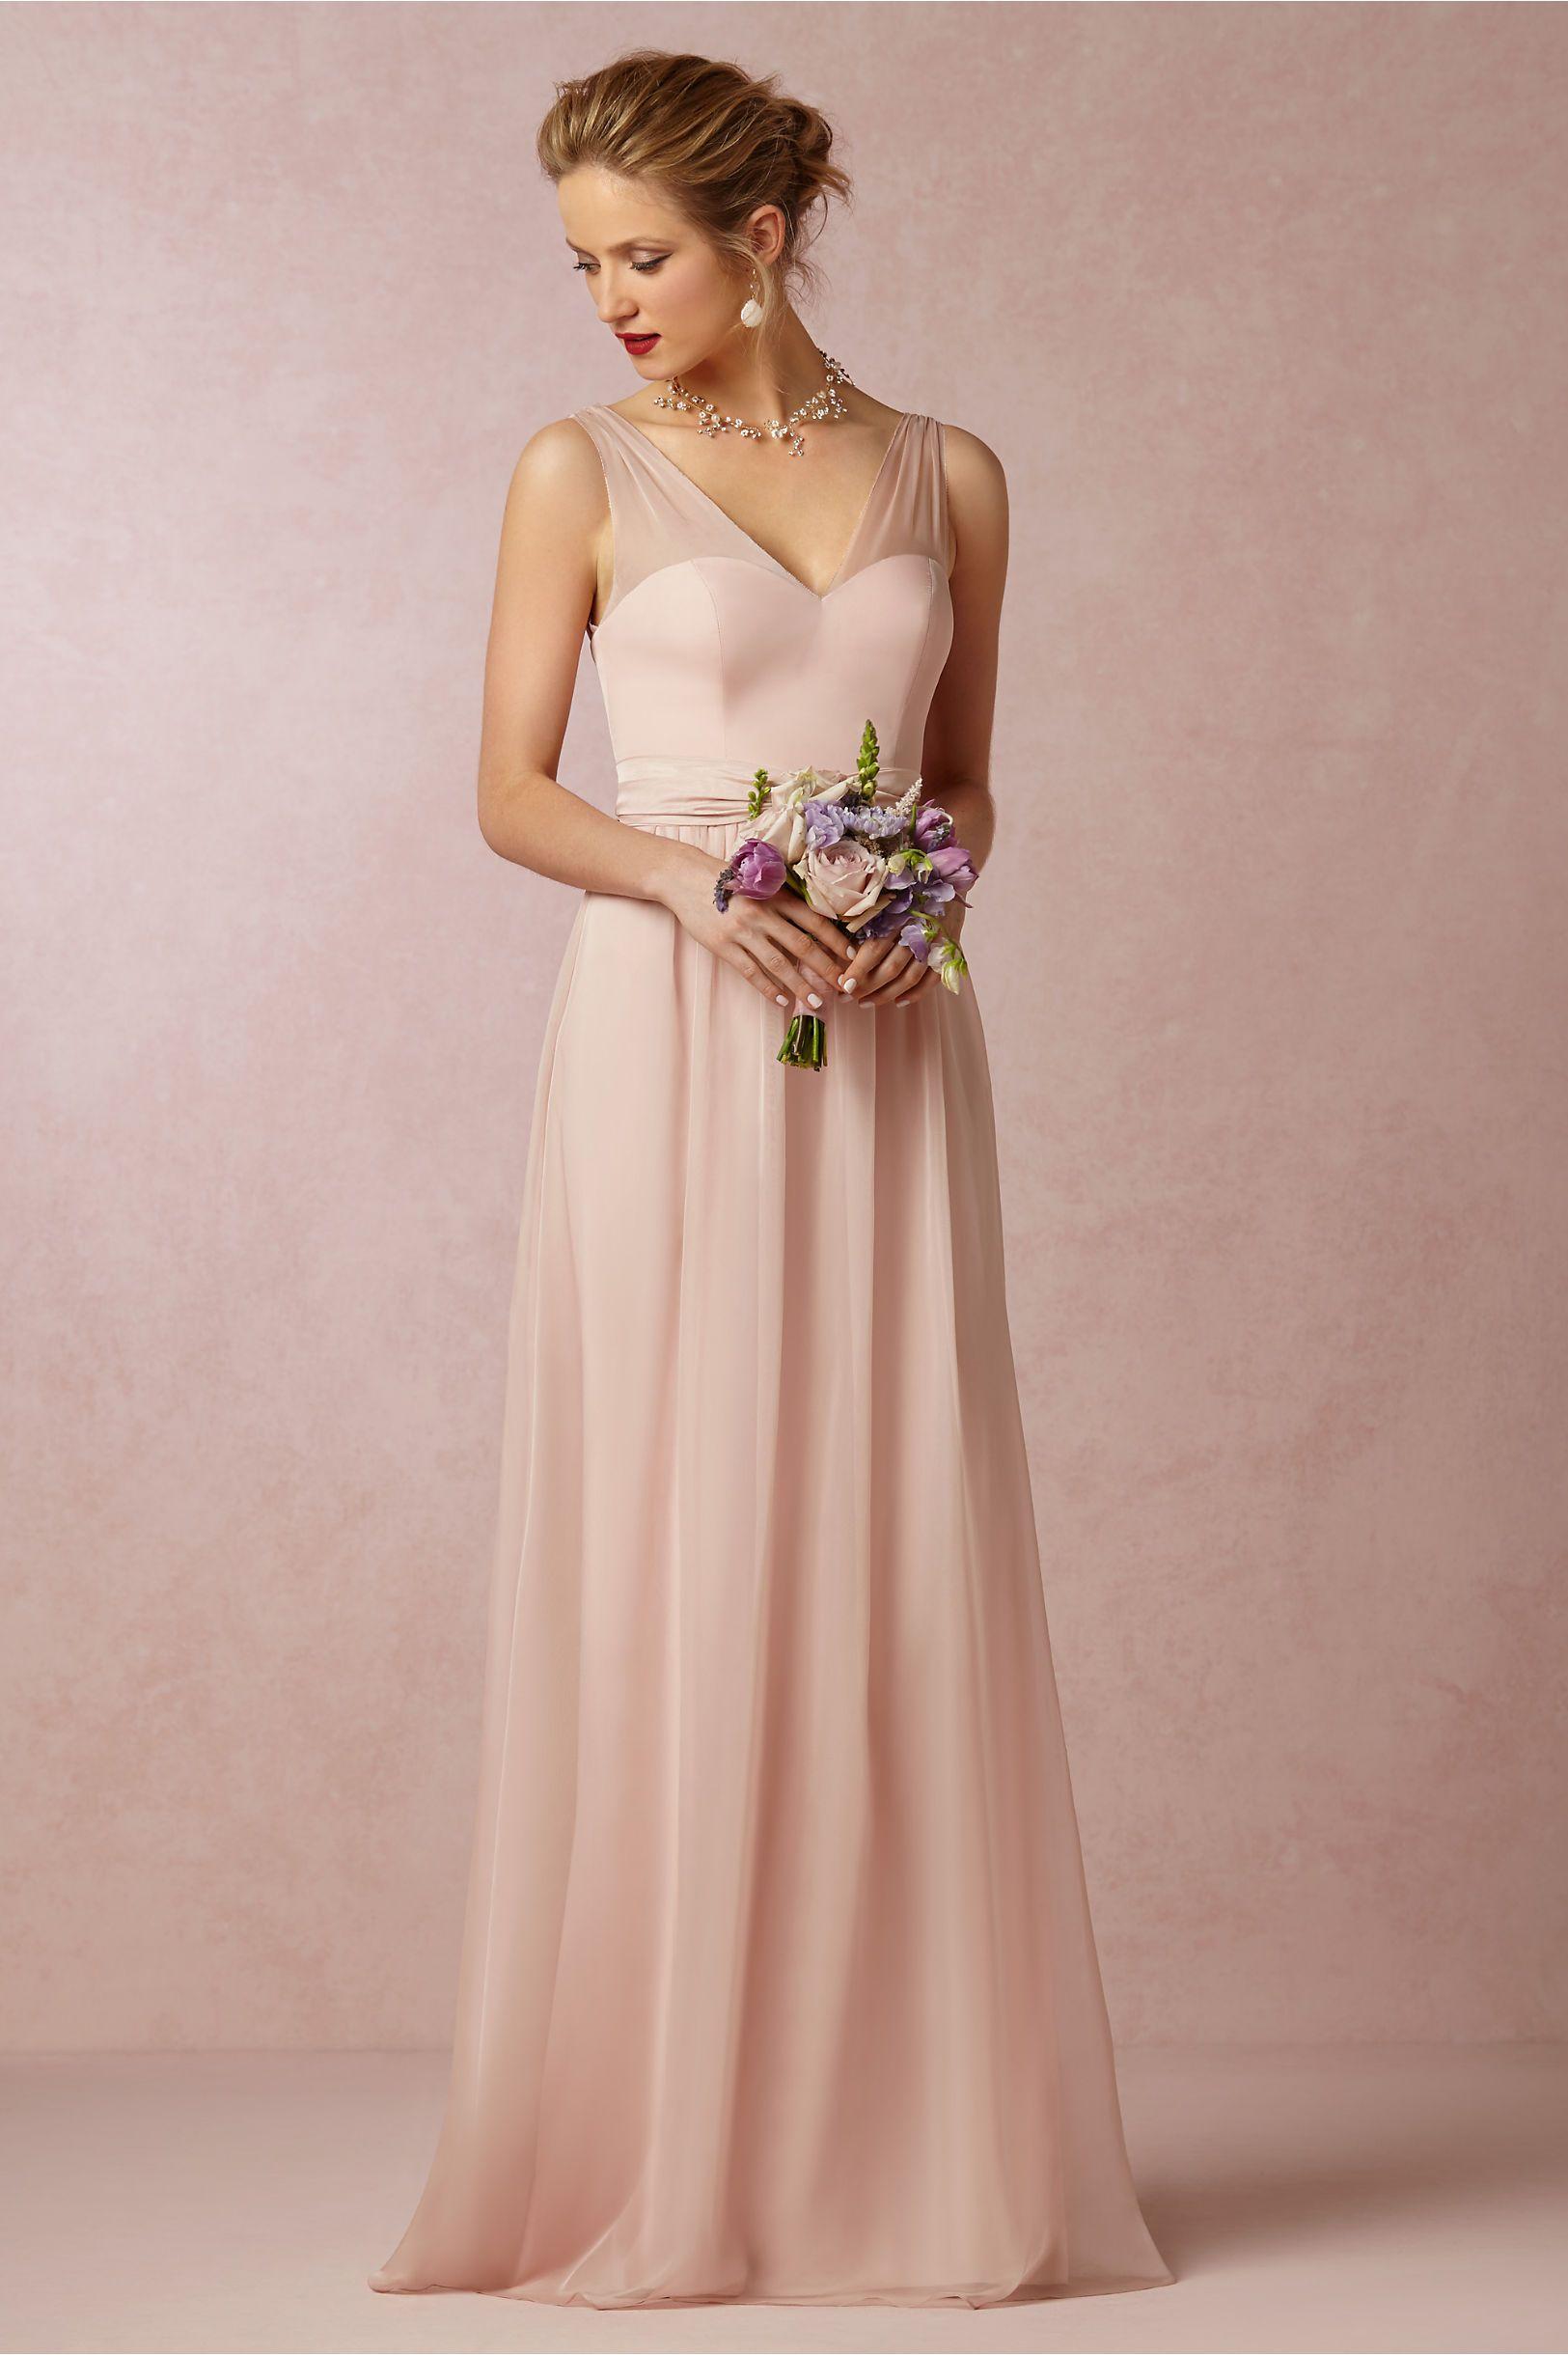 Josephine Dress from BHLDN | Things to Wear | Pinterest | Wedding ...